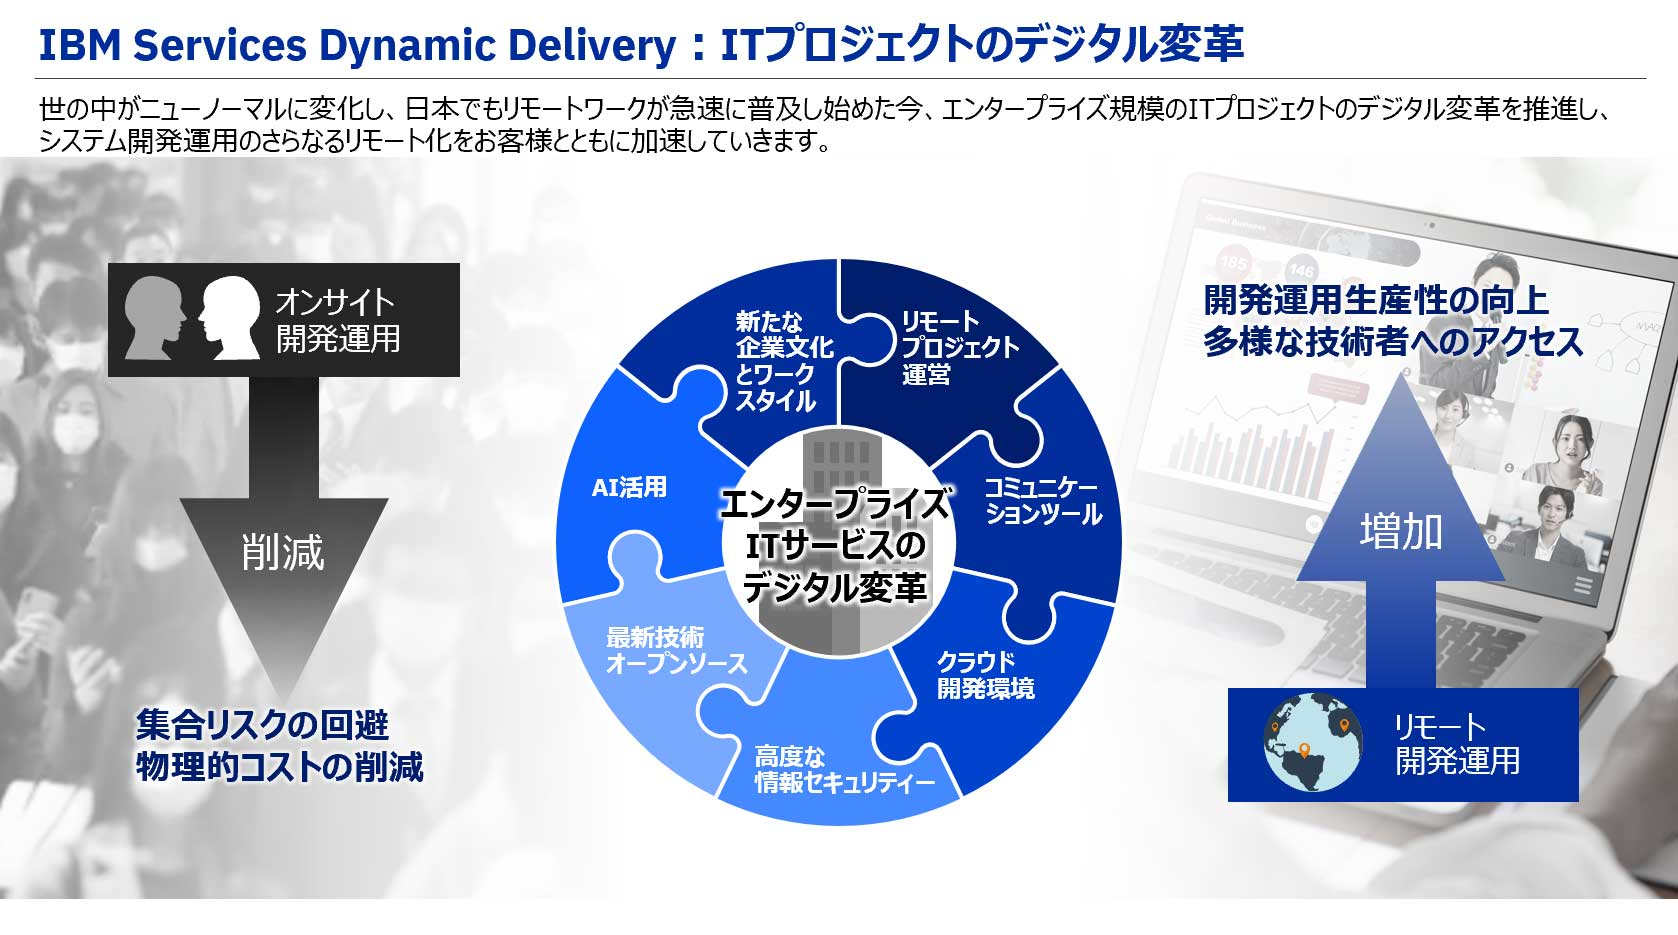 IBM Services Dynamic Delivery:ITプロジェクトのデジタル変革